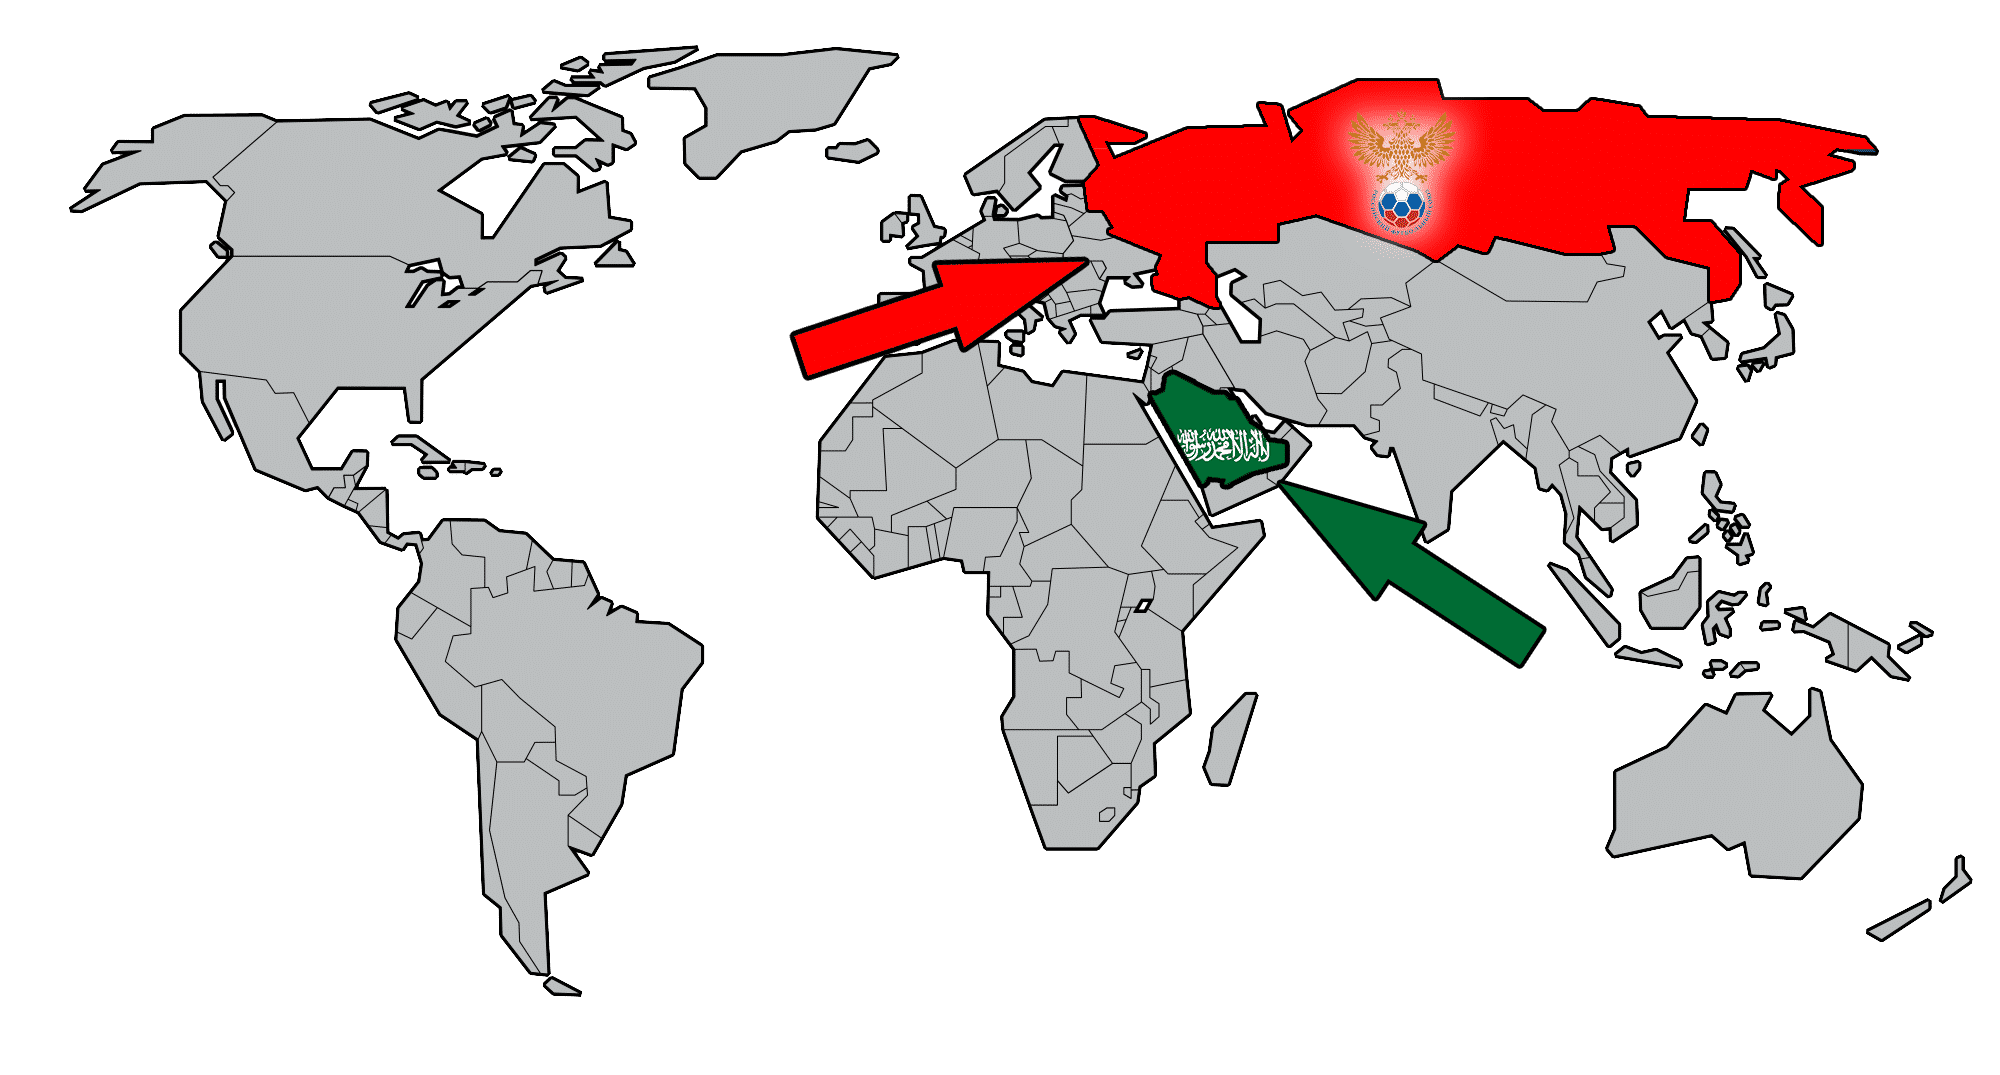 WORLD CUP CLASH PREVIEW: Russia vs Saudi Arabia - Sports of the Day